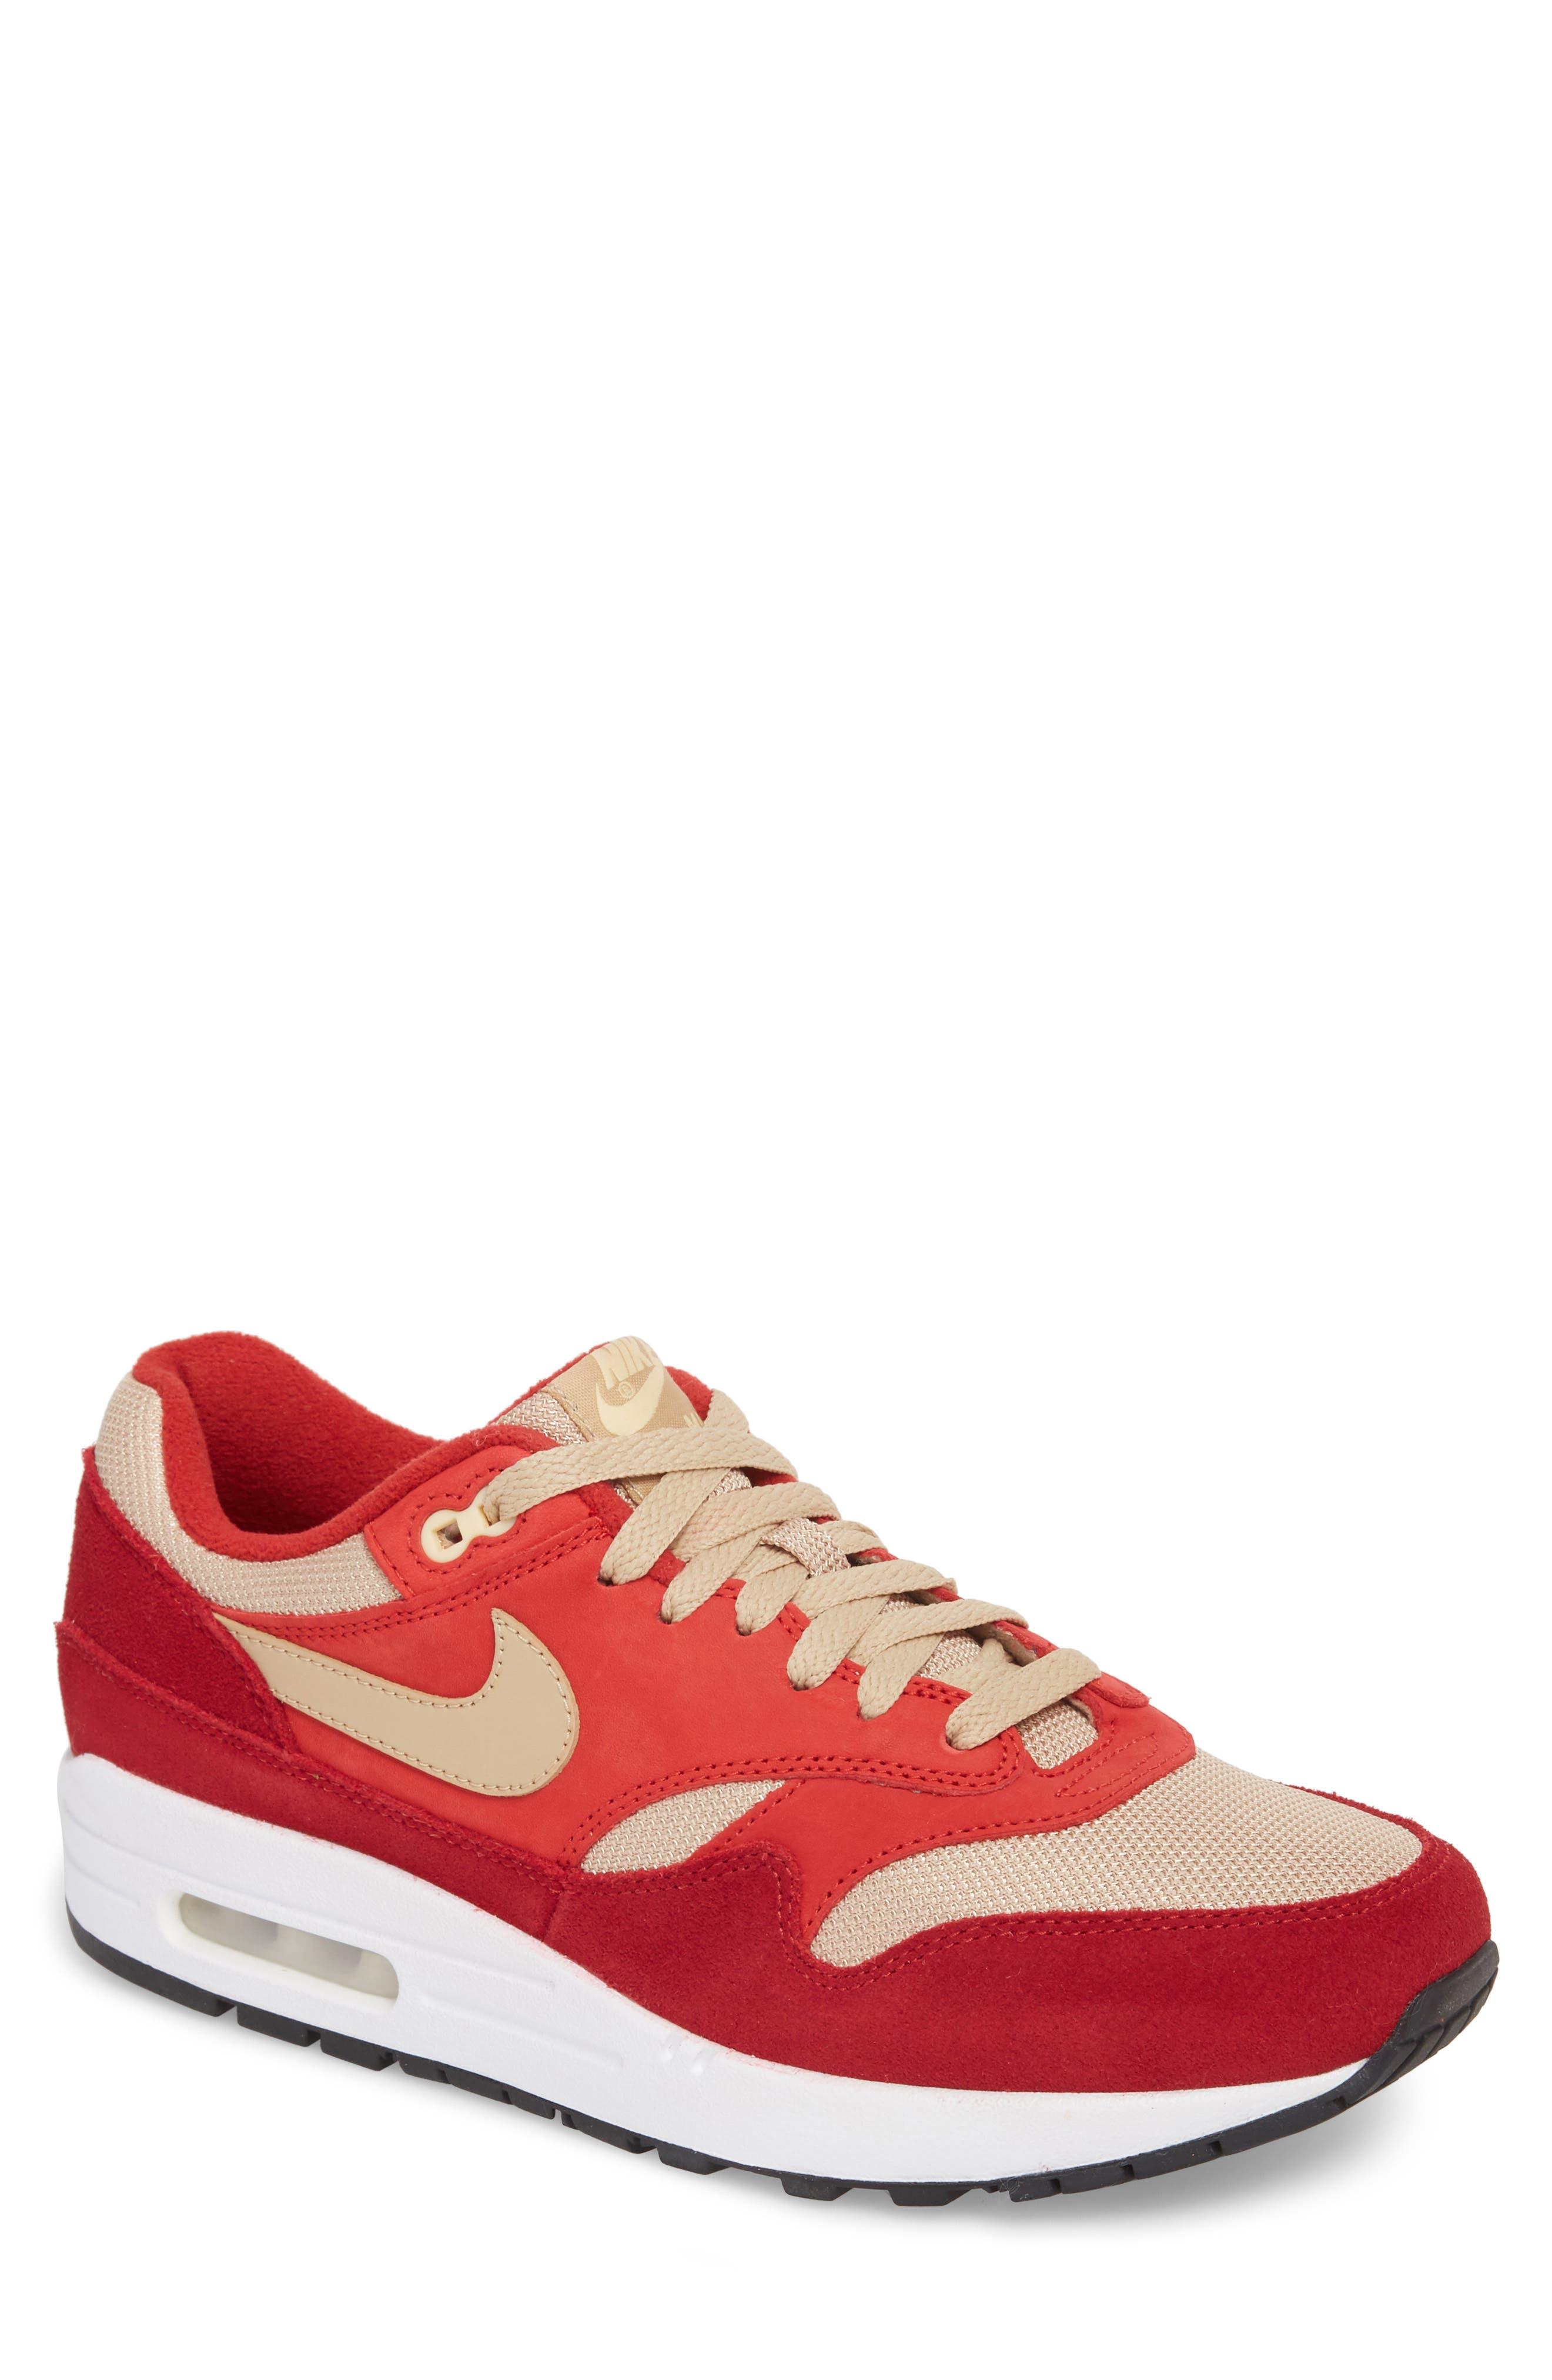 Air Max 1 Premium Retro Sneaker,                         Main,                         color, Red/ Mushroom-Red-Vanilla